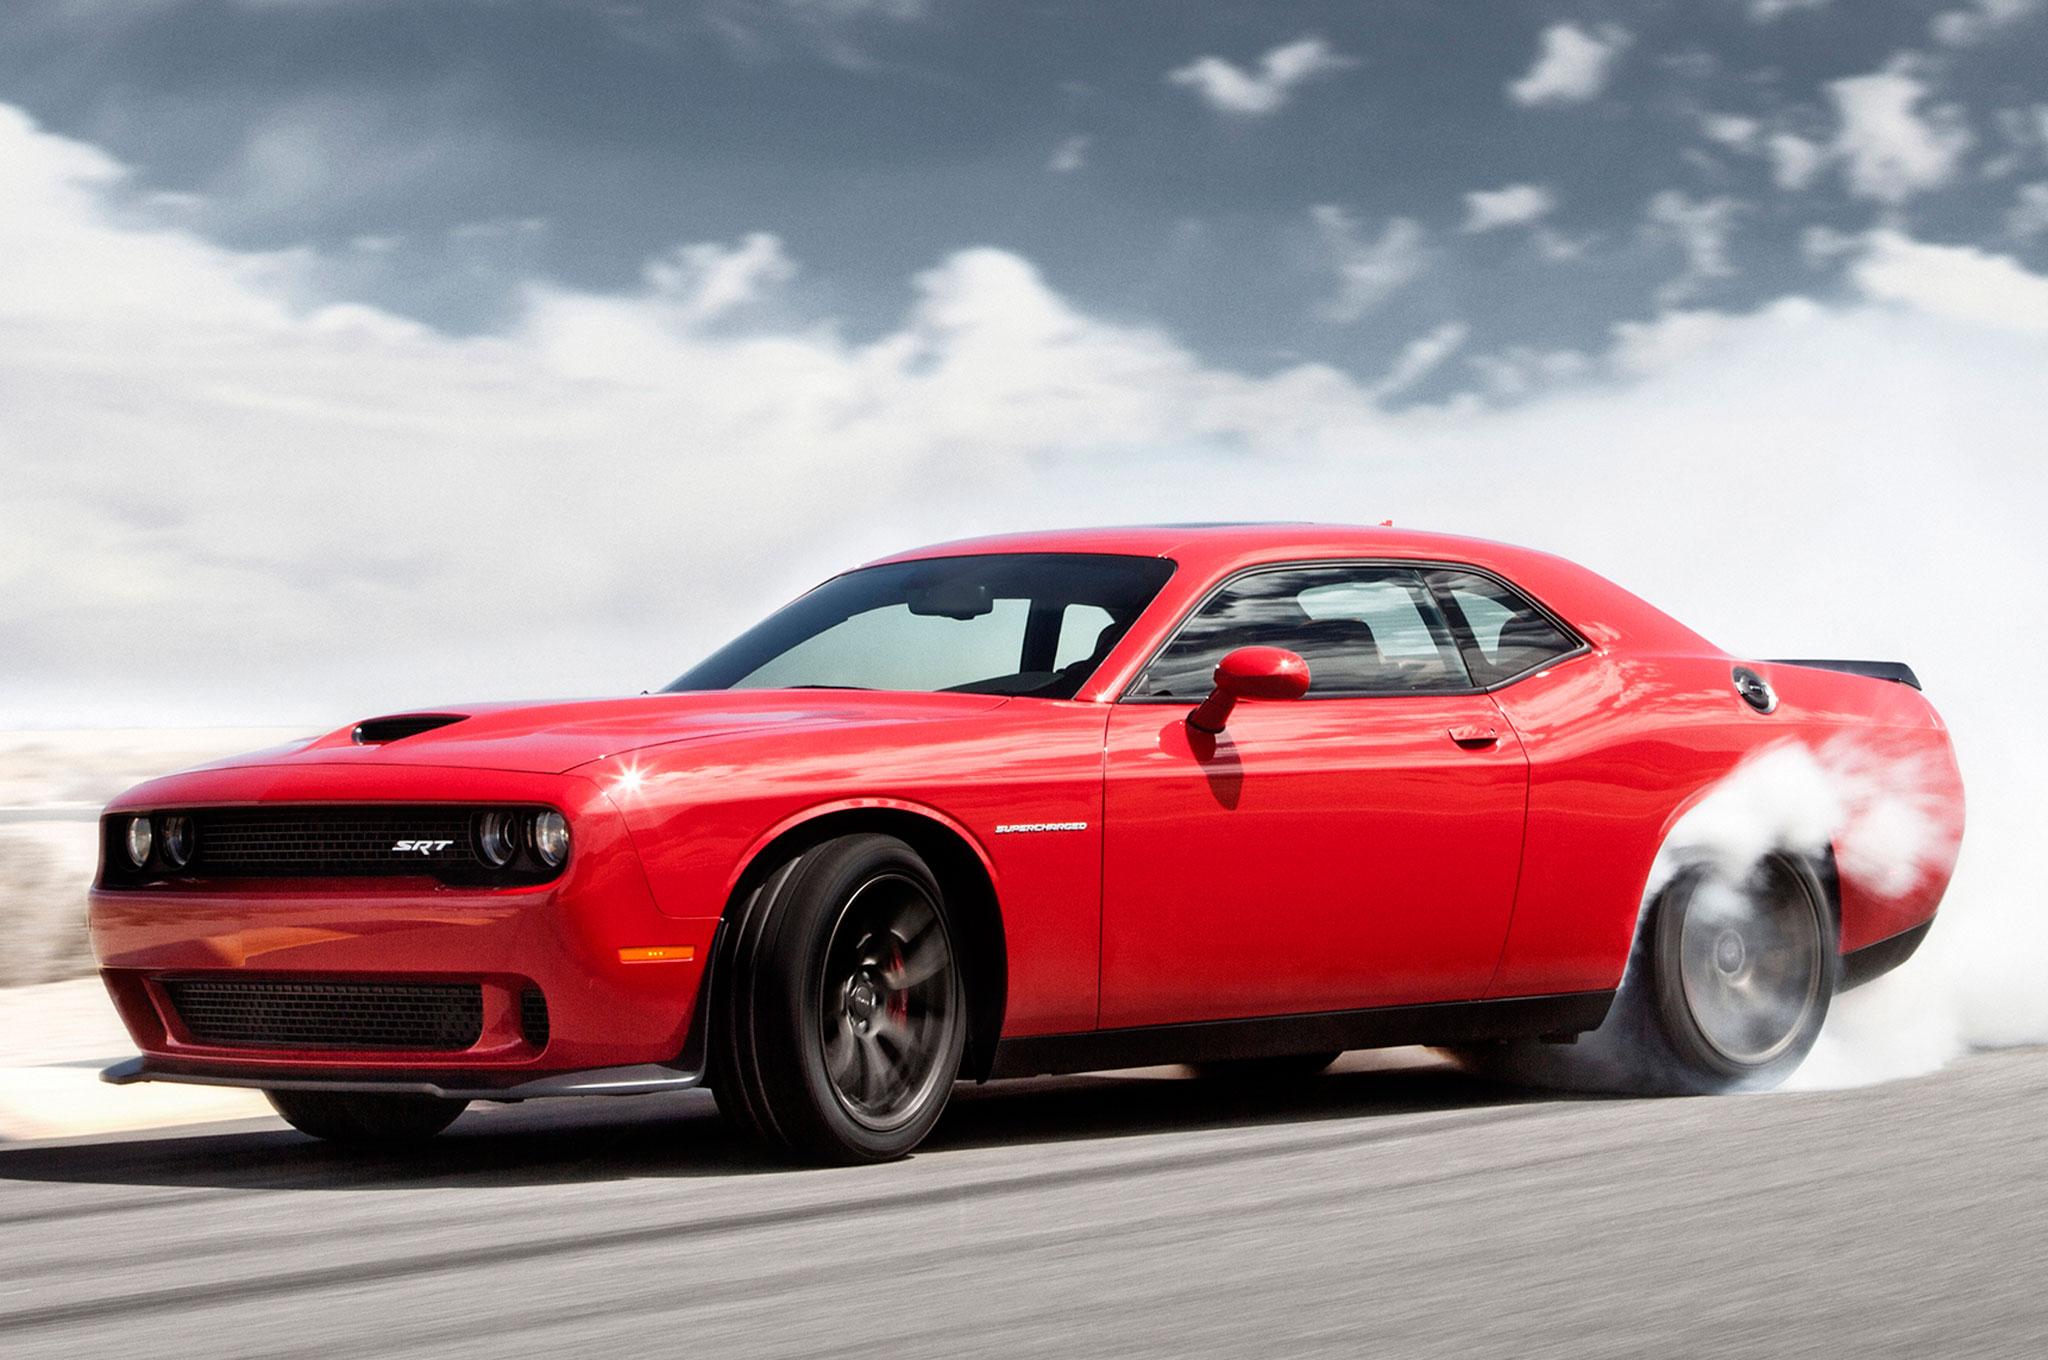 2015 Dodge Challenger SRT Hellcat1